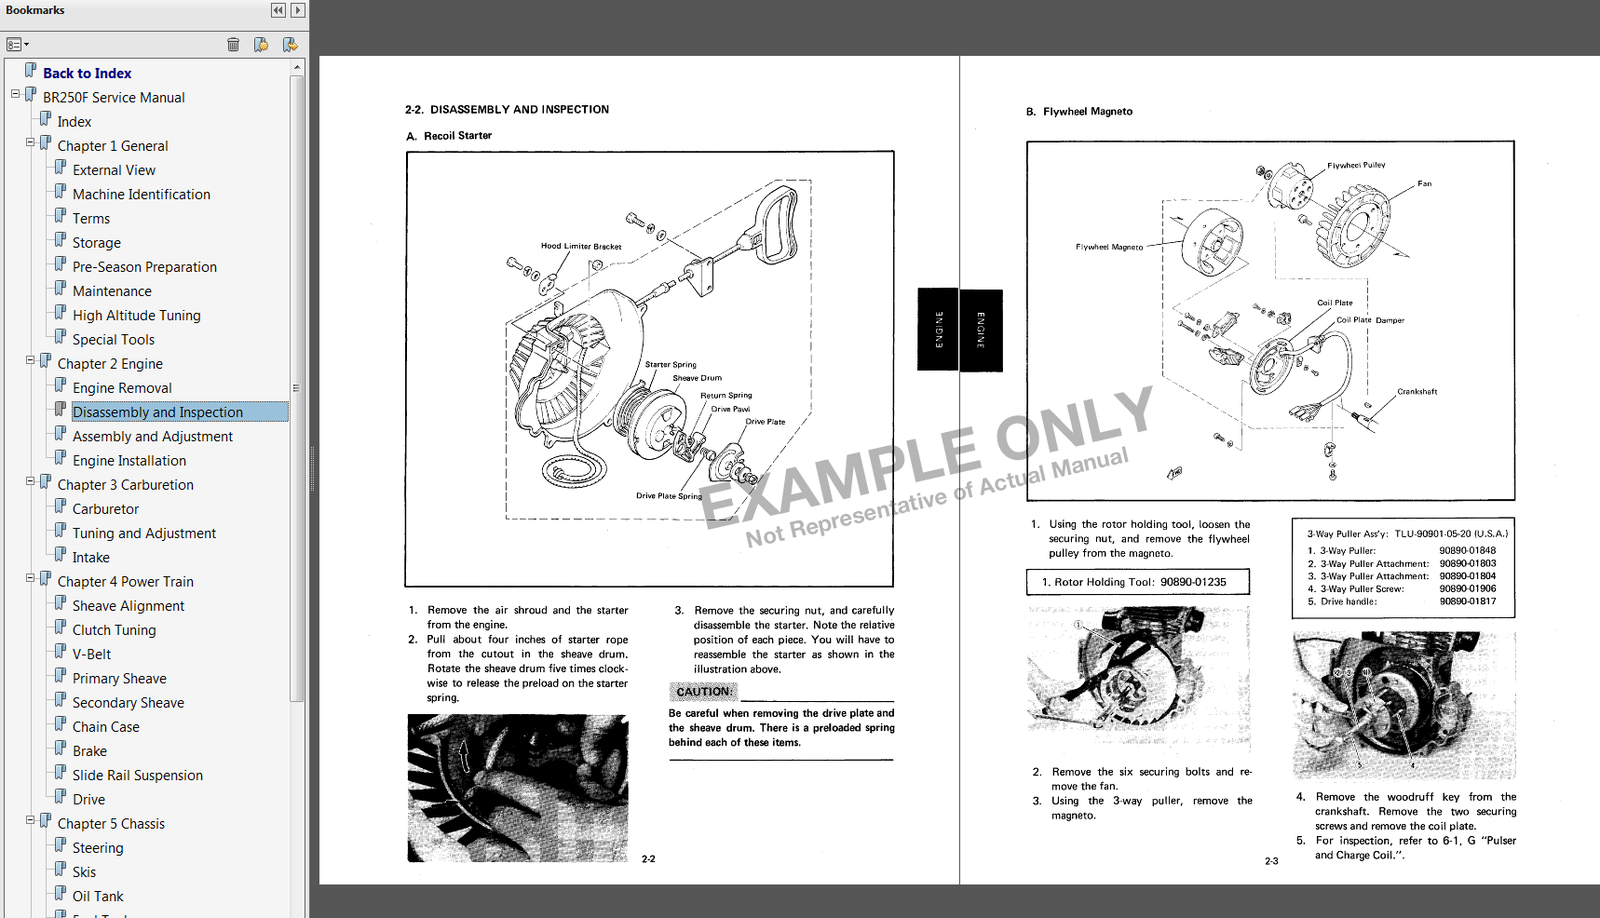 2007 Yamaha Phazer Wiring Diagrams Simple Schema 1999 Polaris Diagram Ll Exhaust